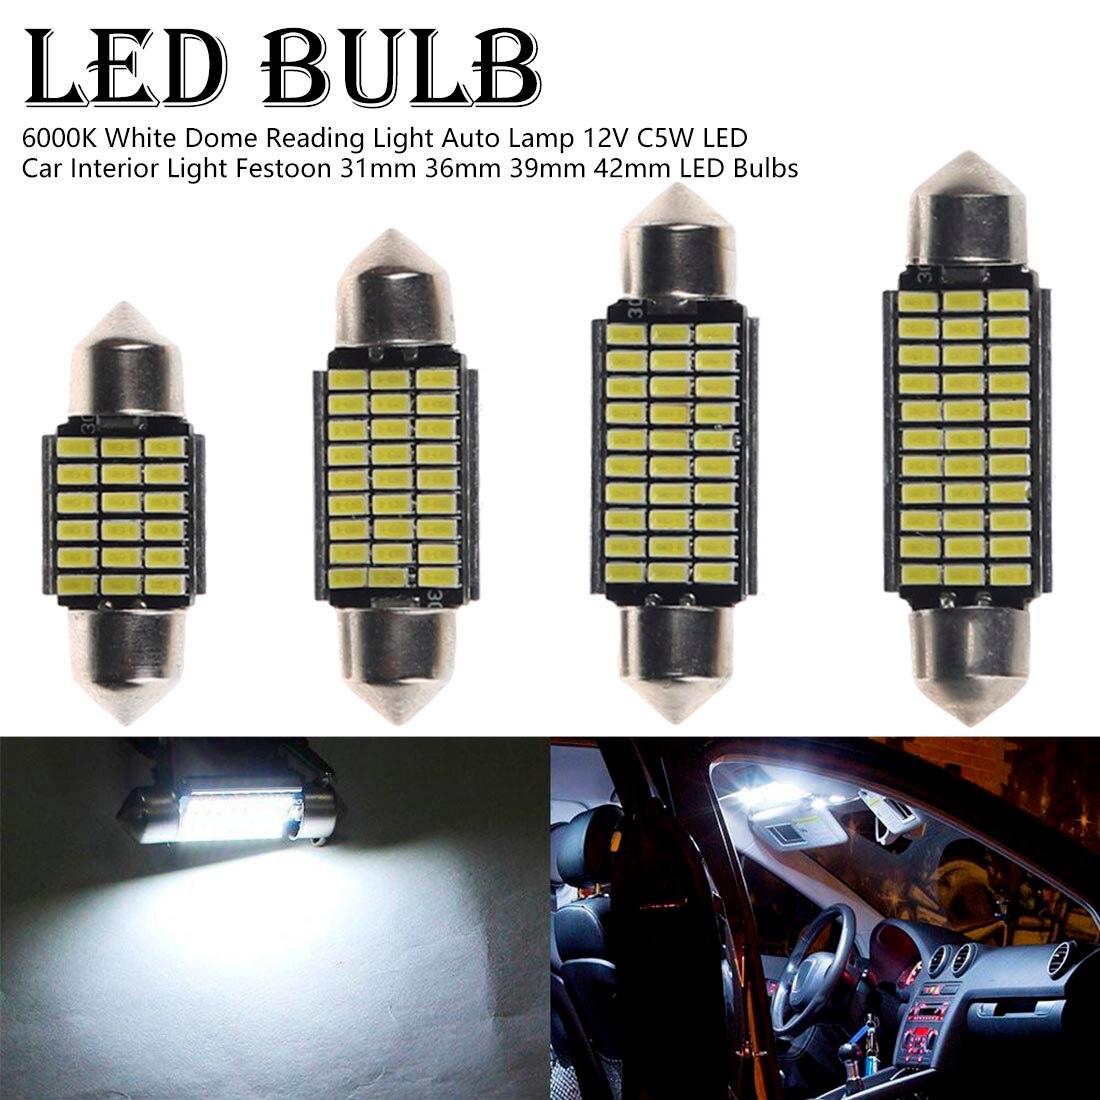 1 Uds C5W LED Interior del coche luz Canbus adorno 31mm 36mm 39mm 42mm bombillas LED 6000K blanco luz de techo de lectura de la lámpara 12V/24V